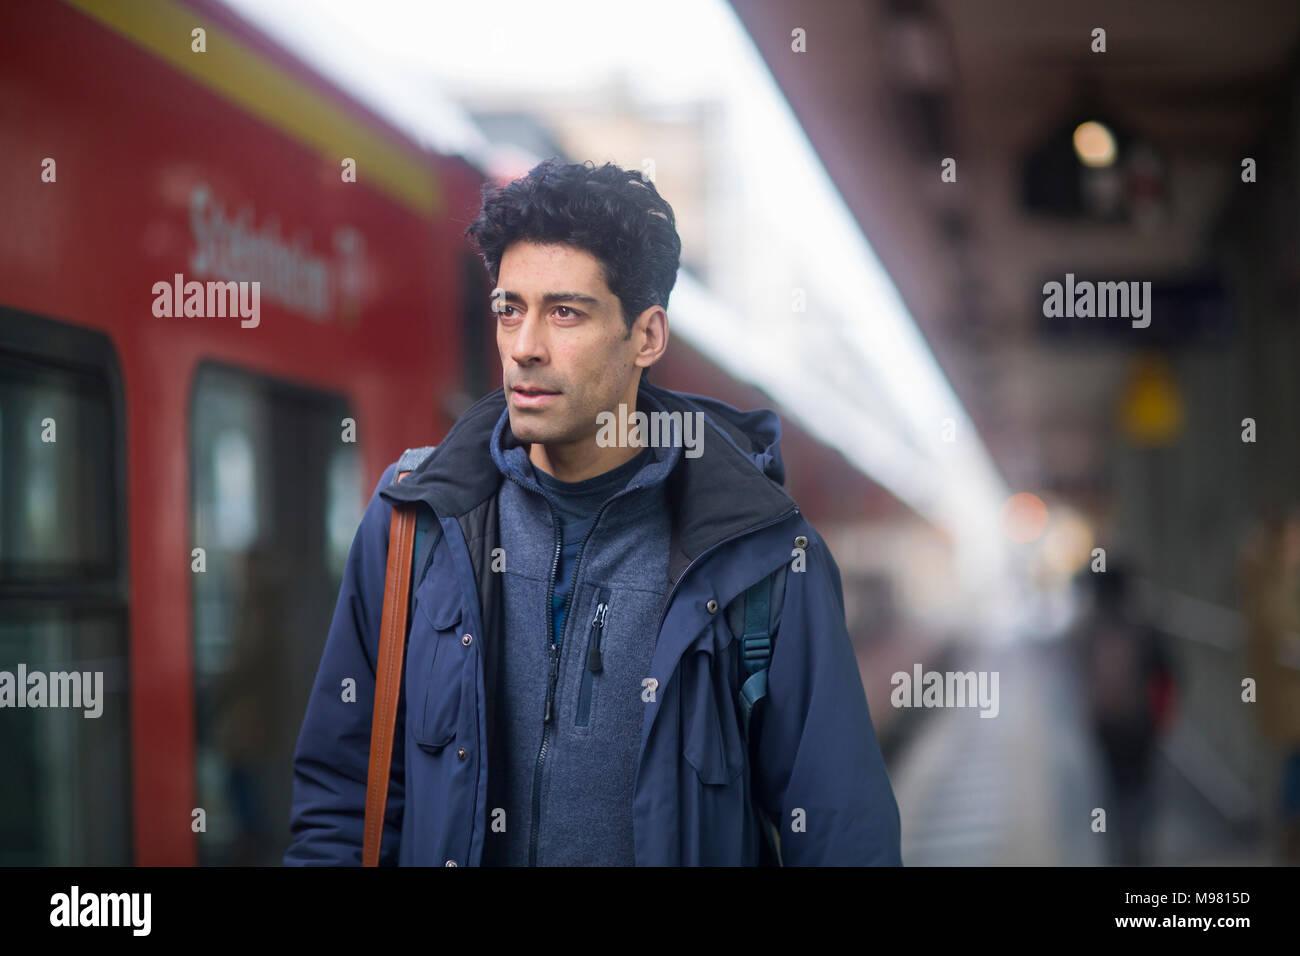 Portrait of man with backpack on platform - Stock Image